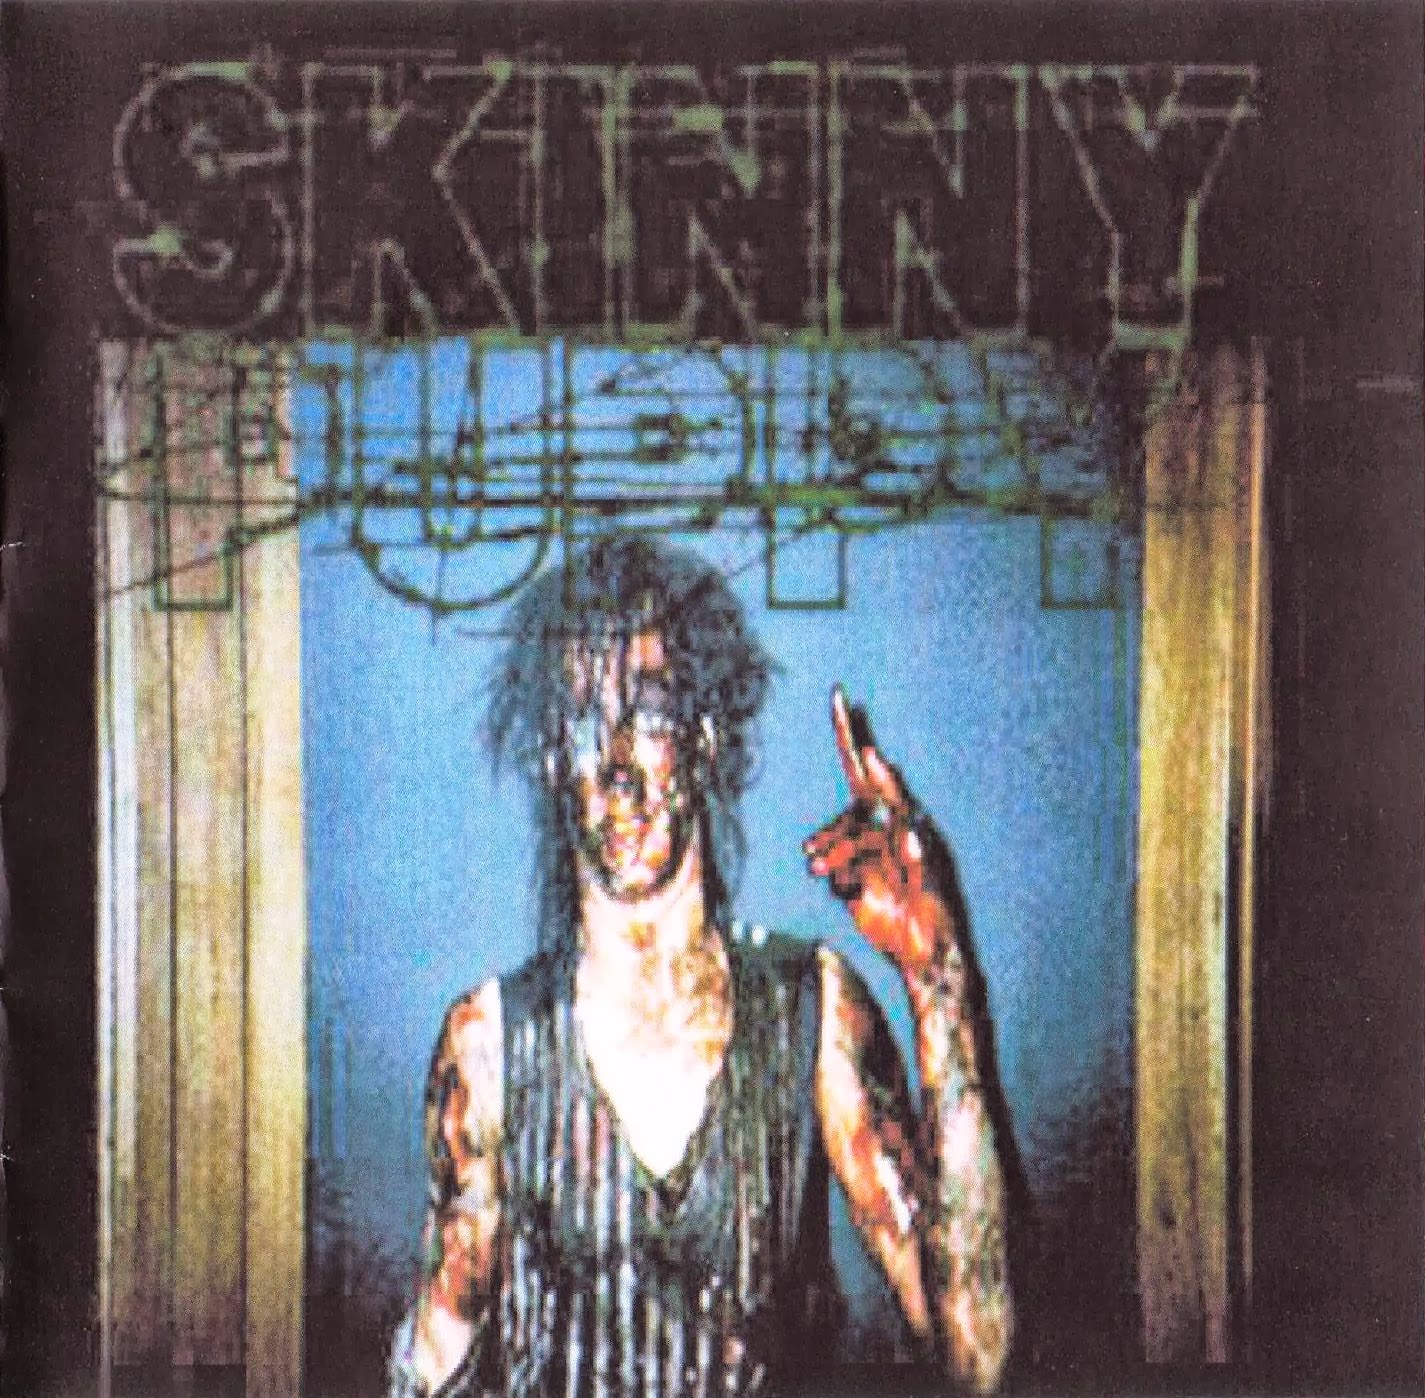 SKINNY PUPPY - The Agora Theatre, Cleveland, OH, USA - 29.05.1992 (WAV)